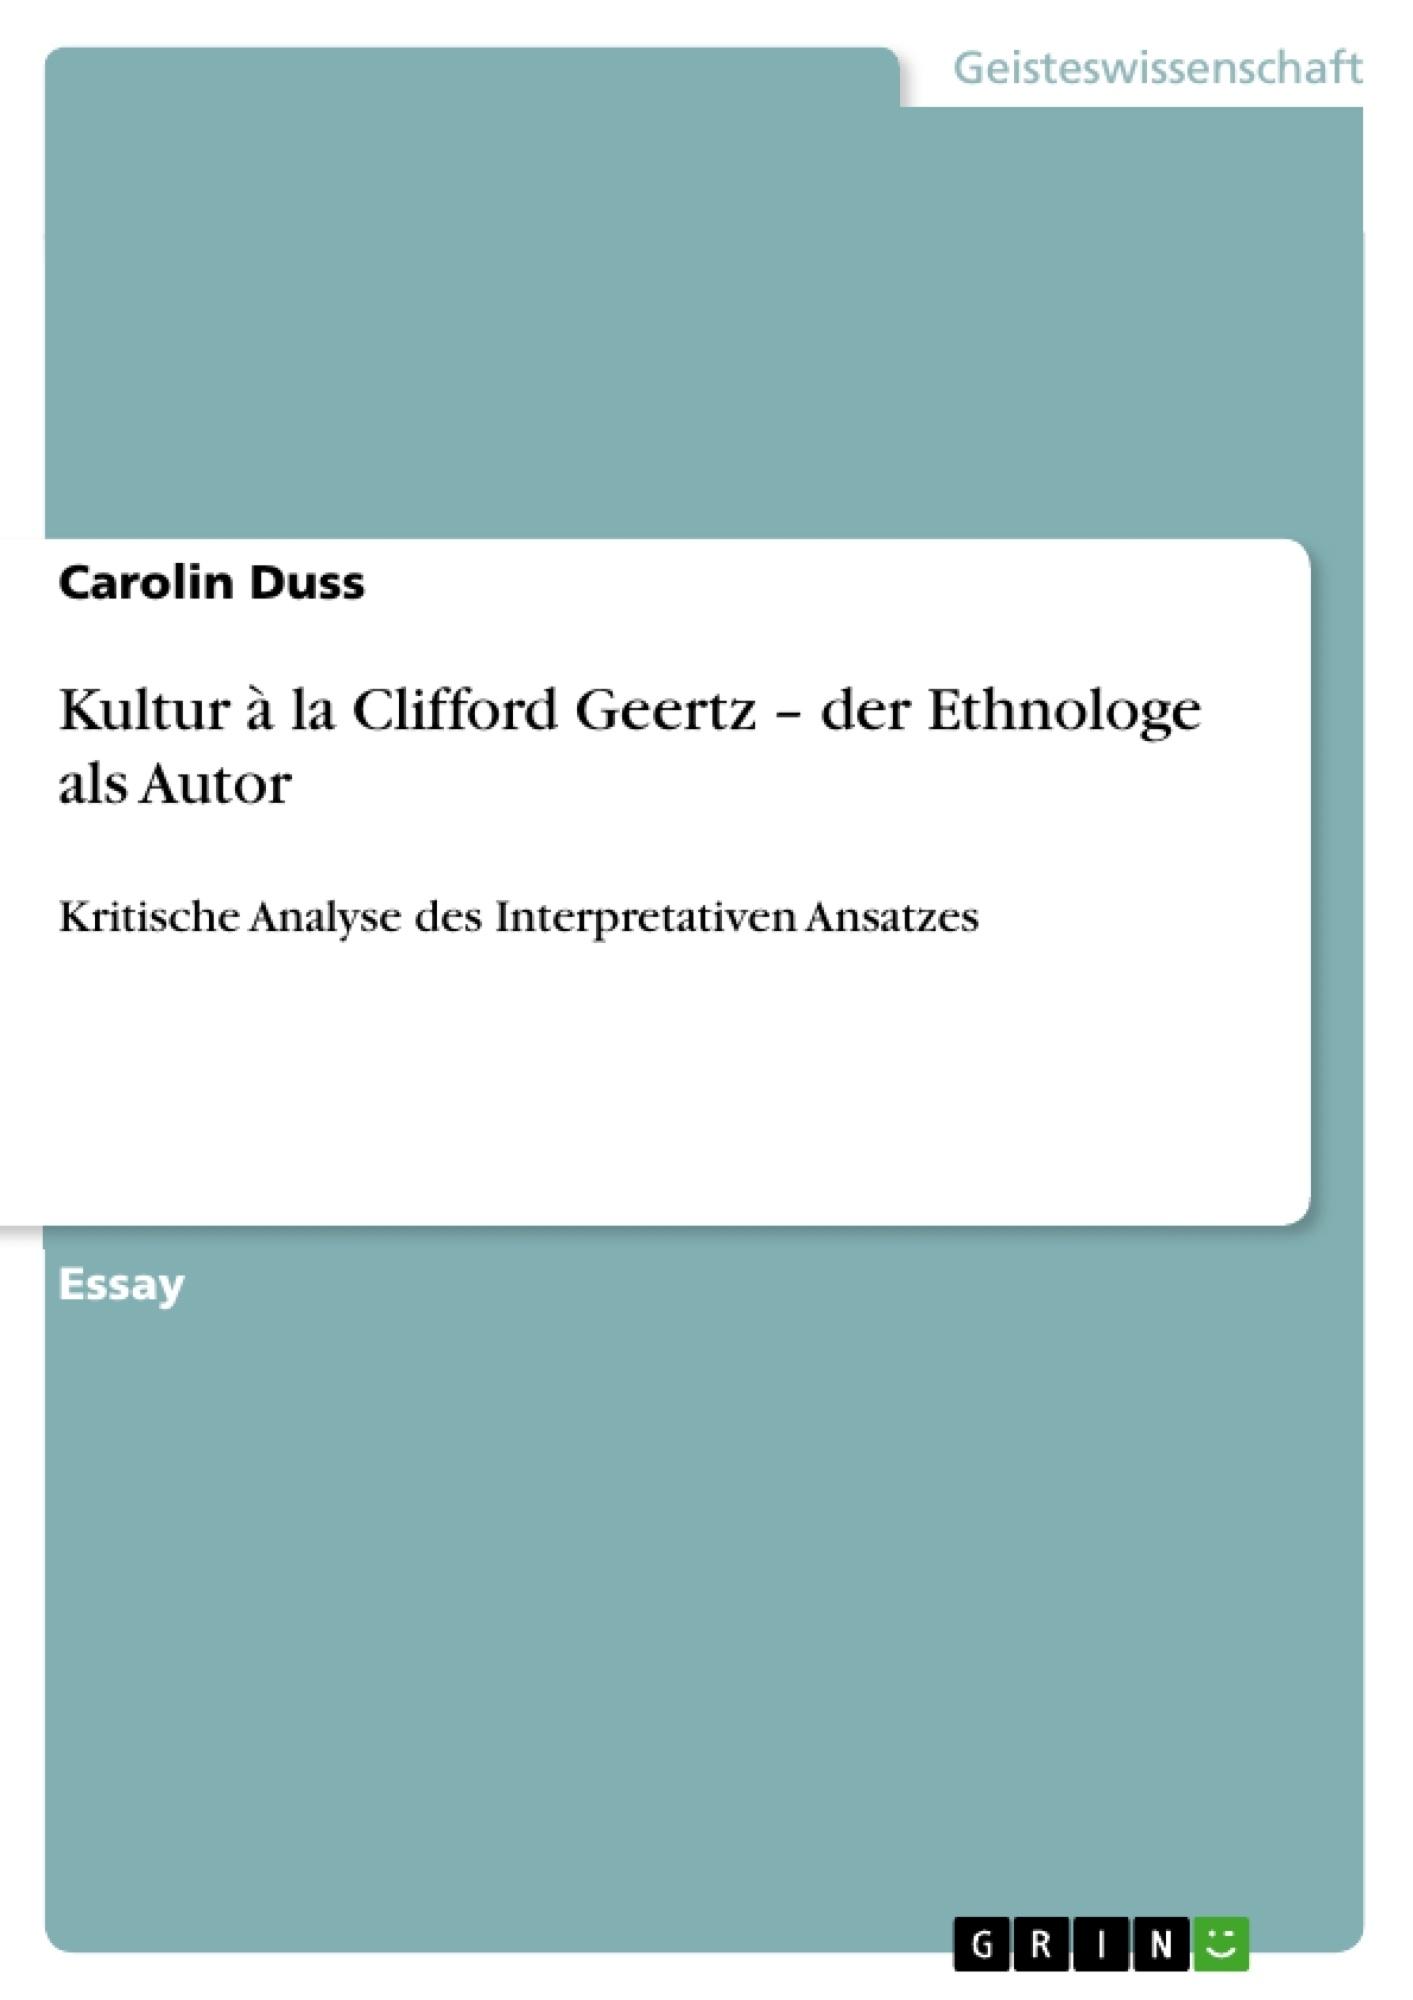 Titel: Kultur à la Clifford Geertz – der Ethnologe als Autor